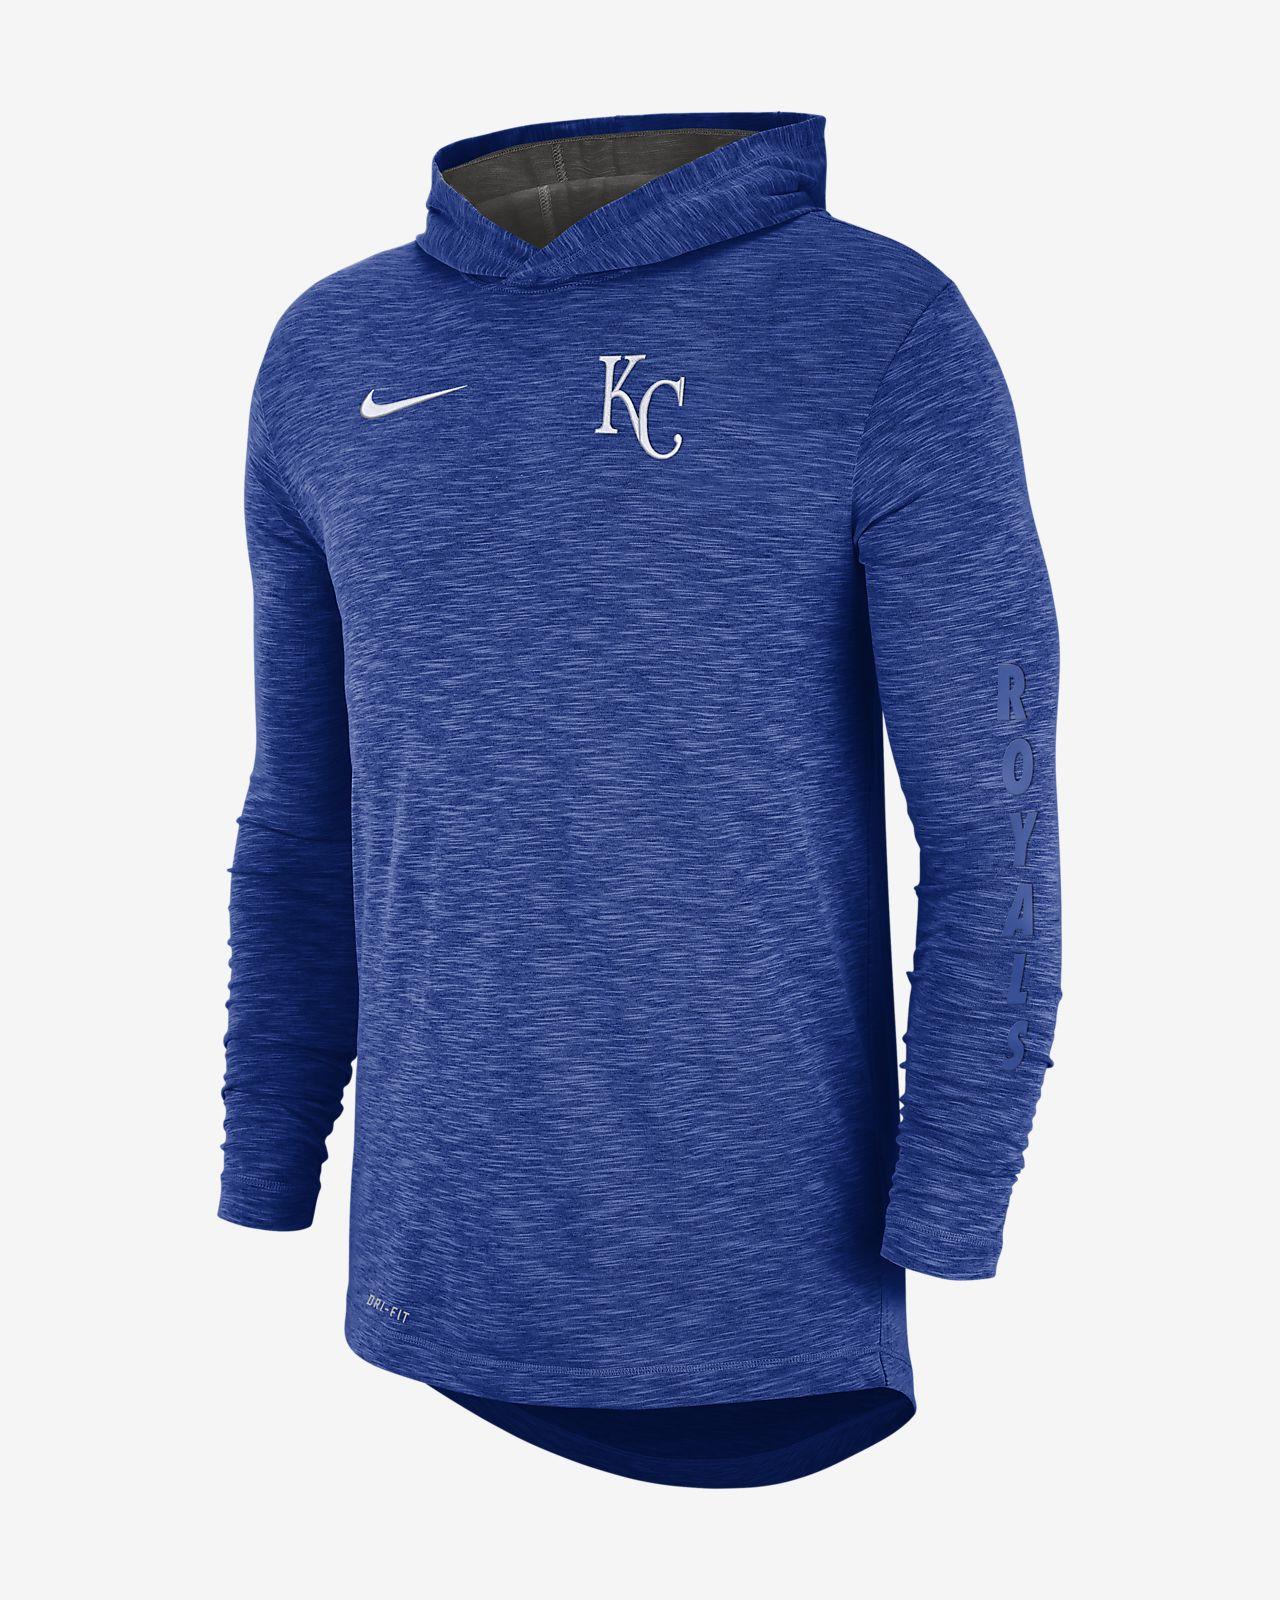 Nike Dri-FIT (MLB Royals) Men's Hooded Top